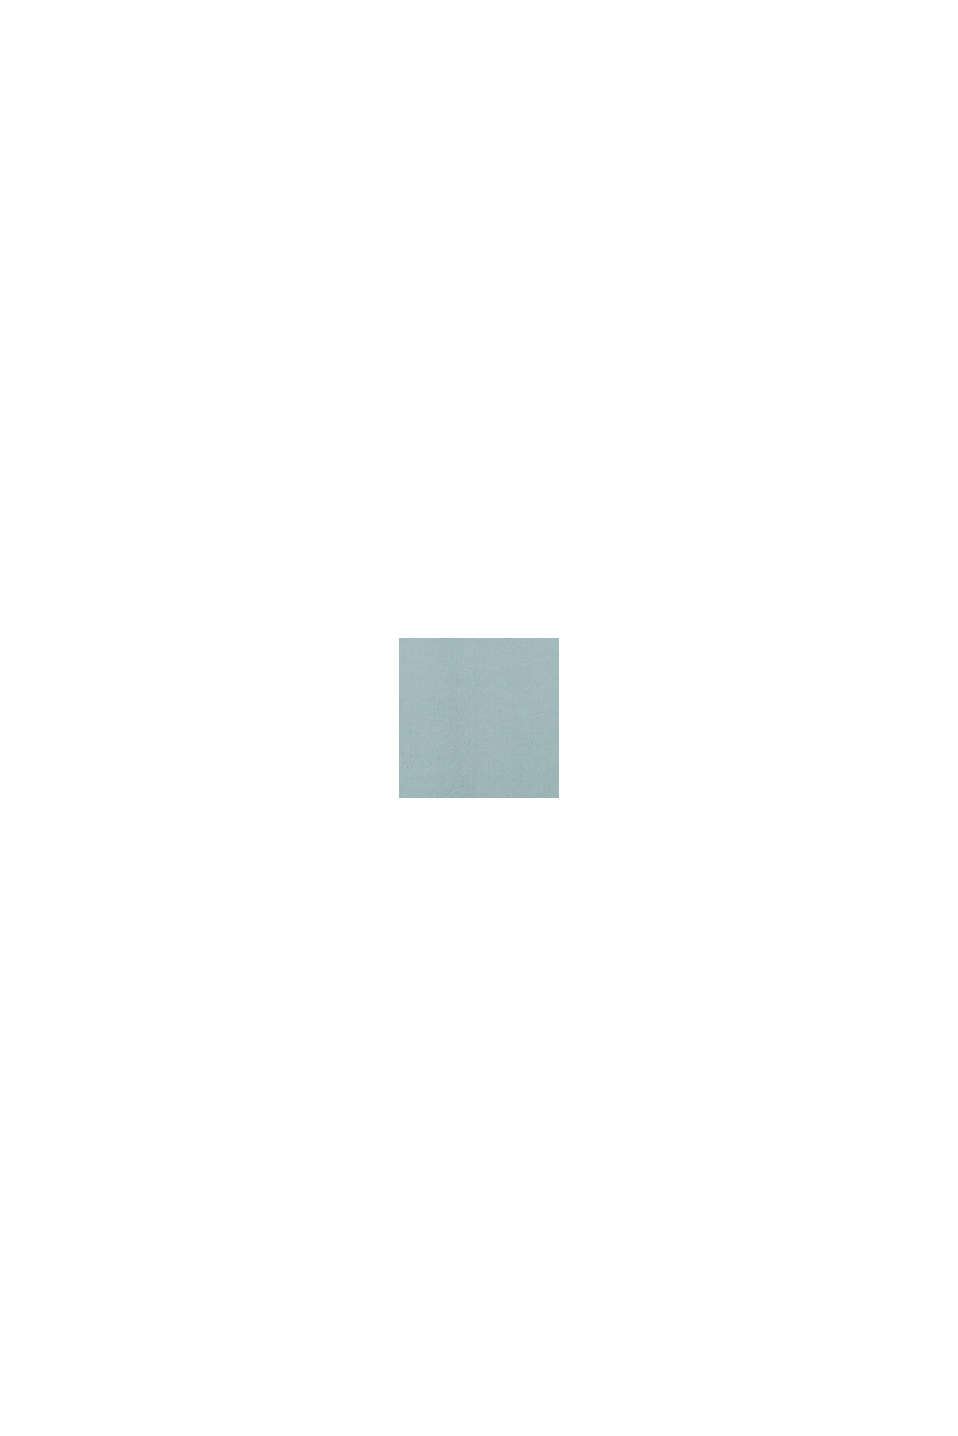 Bluse mit Kelch-Ausschnitt, LENZING™ ECOVERO™, GREY BLUE, swatch